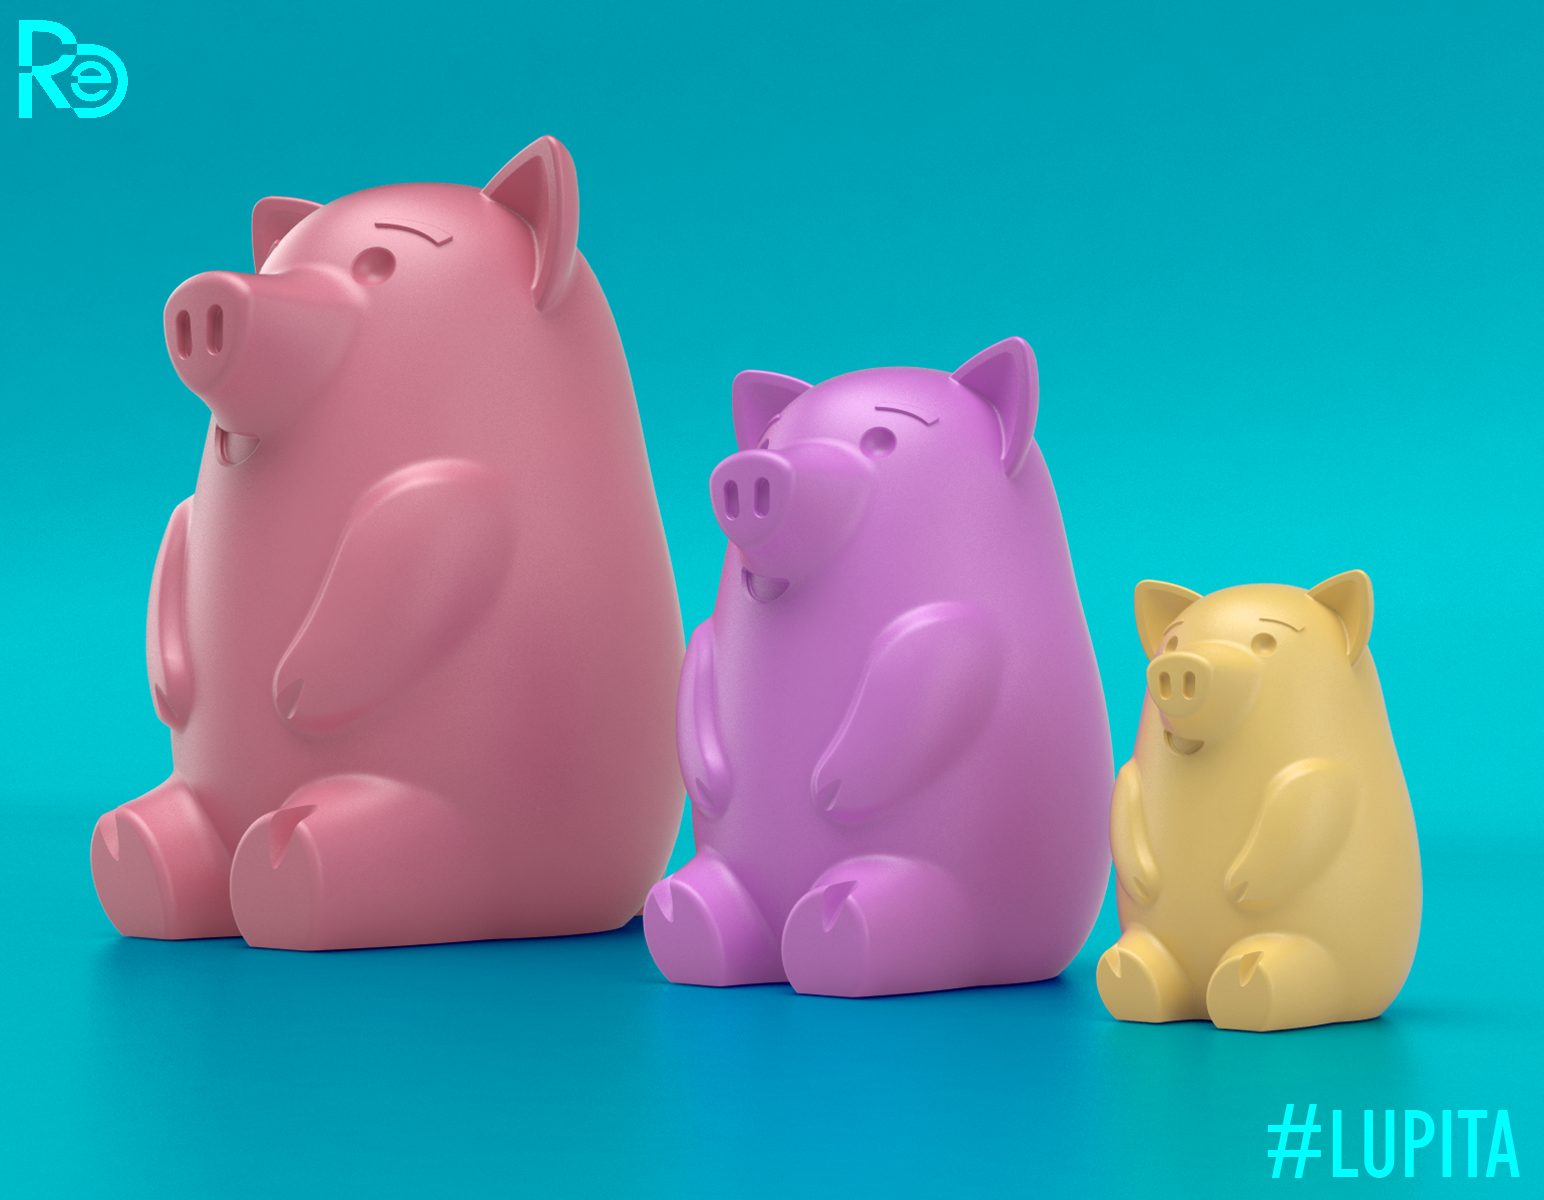 #LUPITA PIGGY BANK CHALLENGE